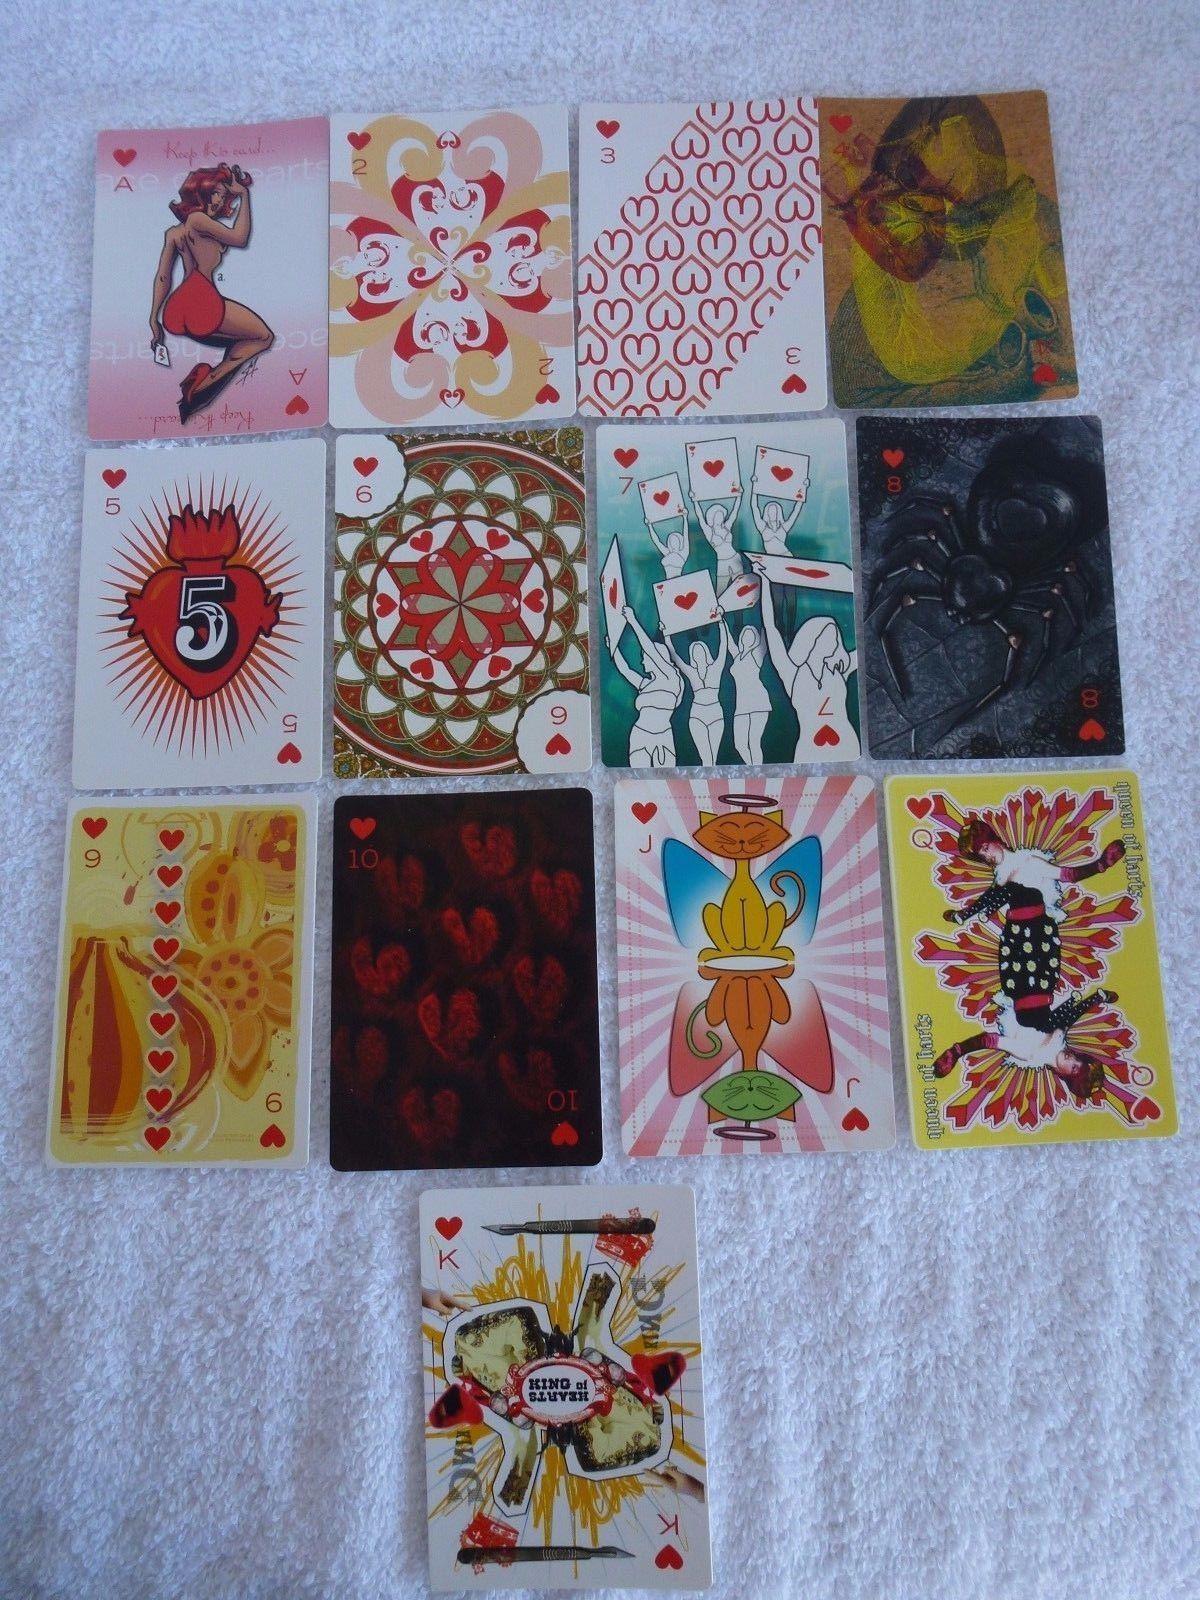 Aiga Las Vegas 2006 Playing Cards Tournament Deck | eBay